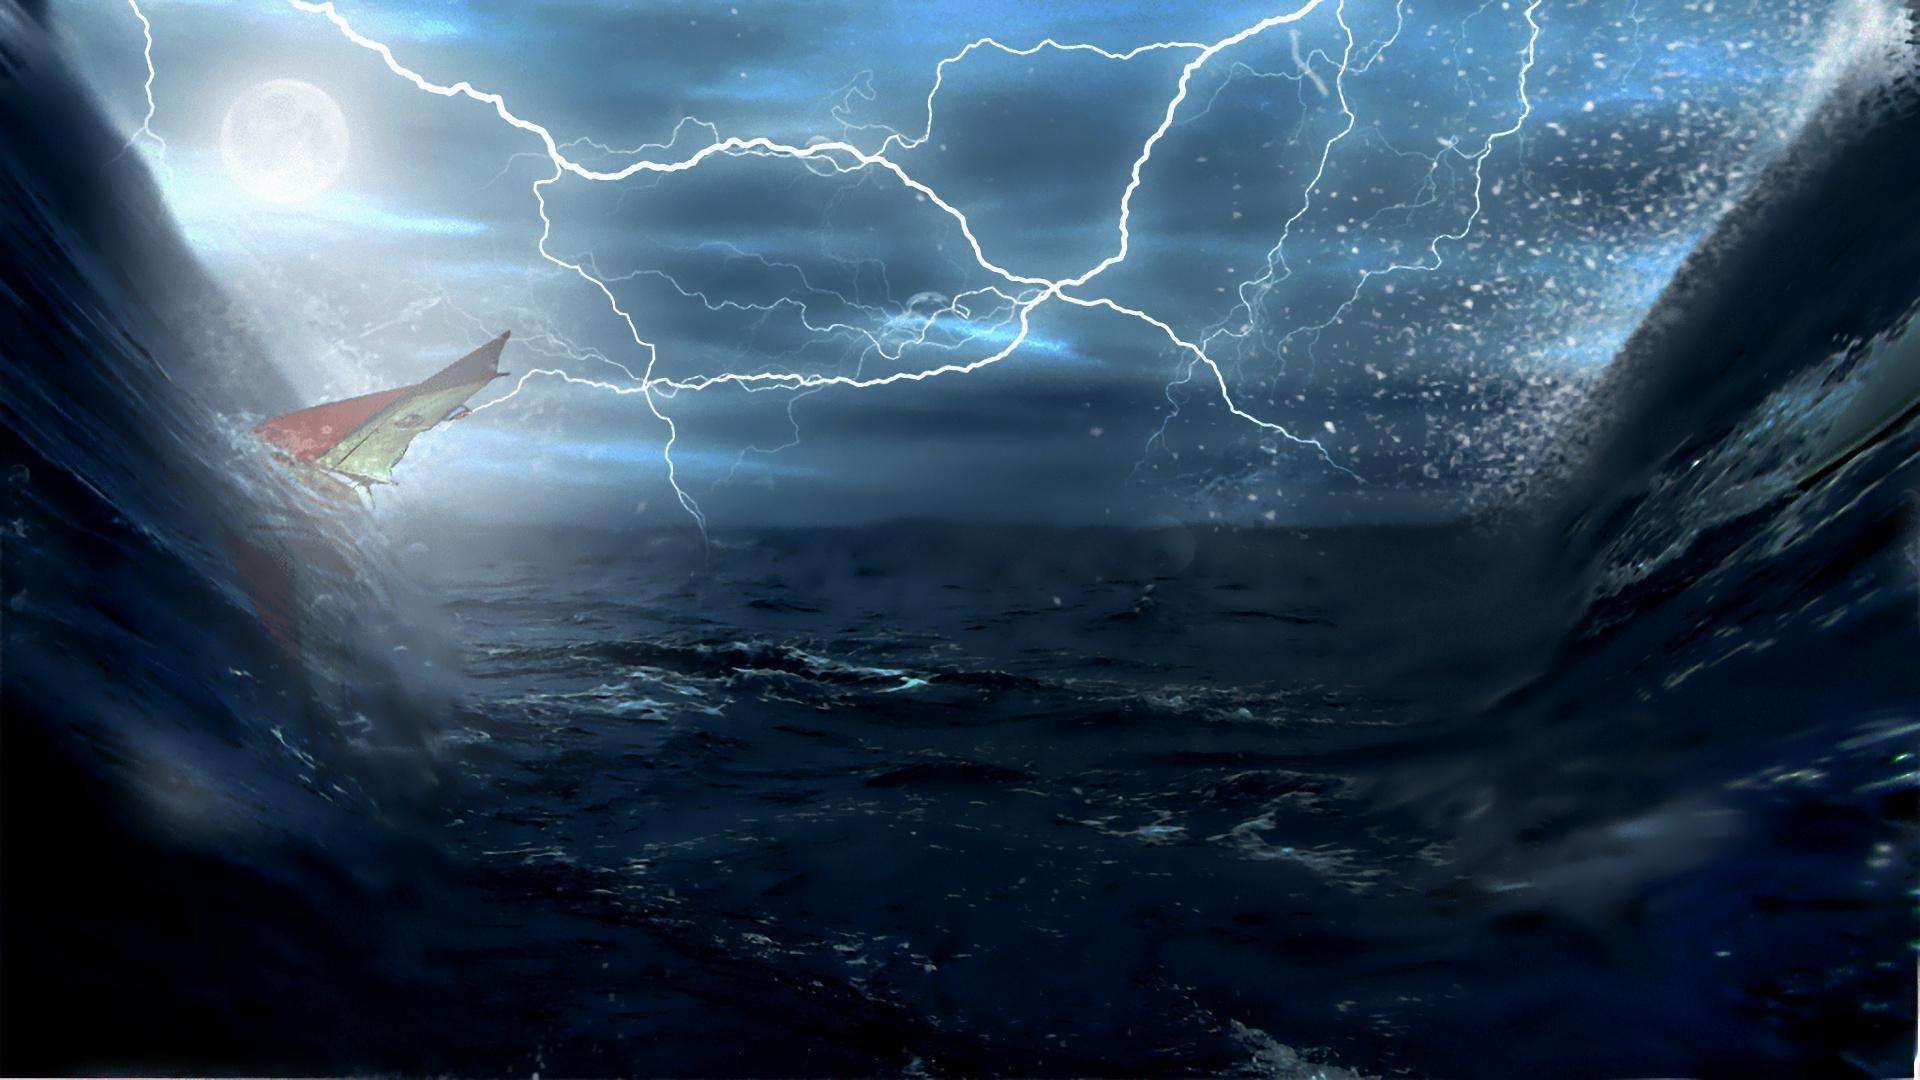 wallpaper.wiki-Lightning-Storm-Ship-Background-PIC-WPD003099